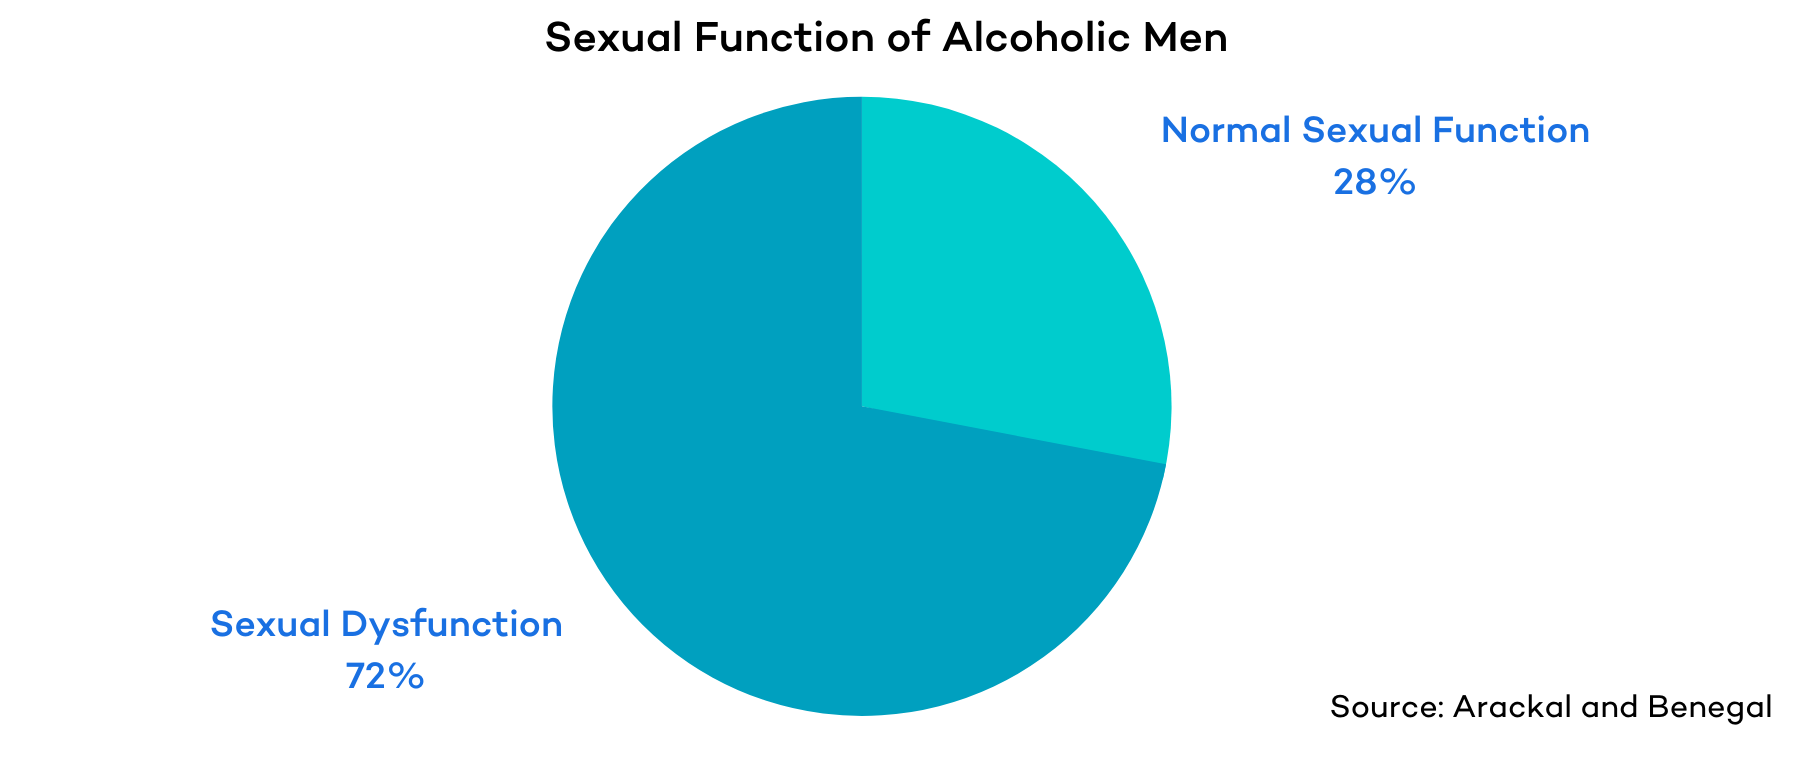 Sexual Function Alcoholic Men